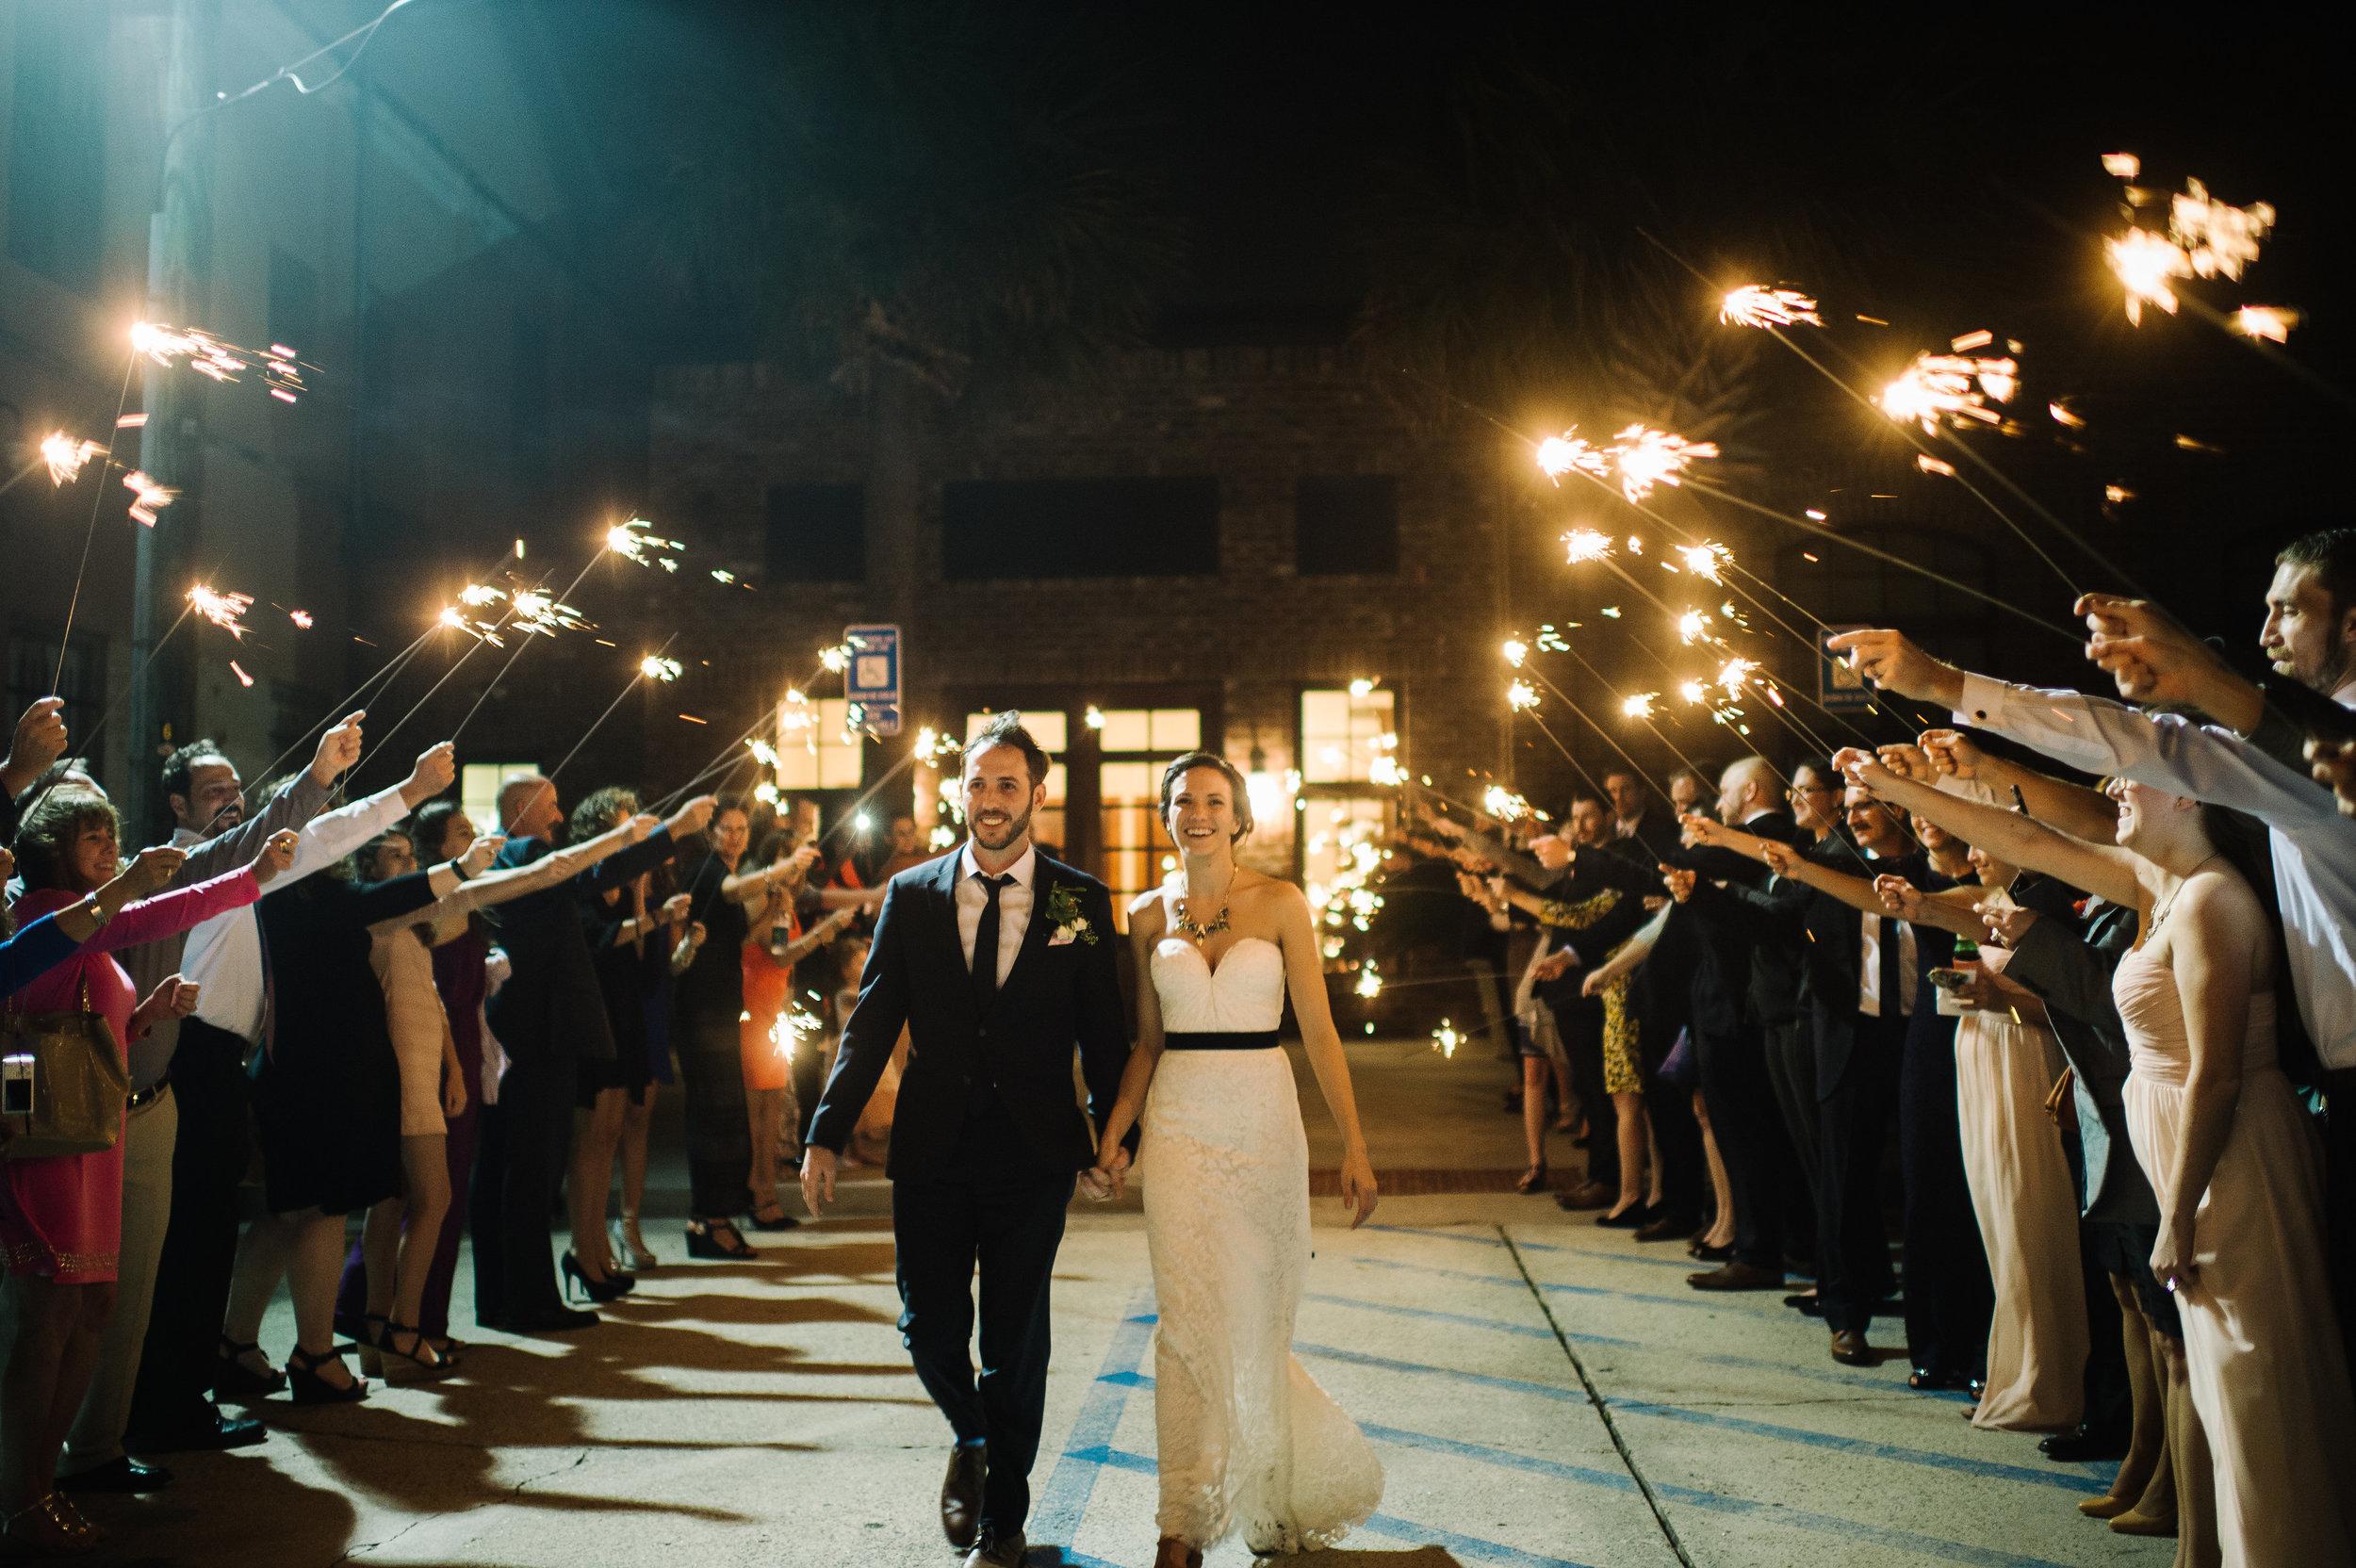 amber-and-paul-rach-loves-troy-charles-h-morris-center-wedding-sarah-seven-helene-lace-wedding-dress-ivory-and-beau-bridal-boutique-savannah-wedding-planner-savannah-event-designer-savannah-florist-savannah-weddings-savannah-bridal-boutique-46.jpg